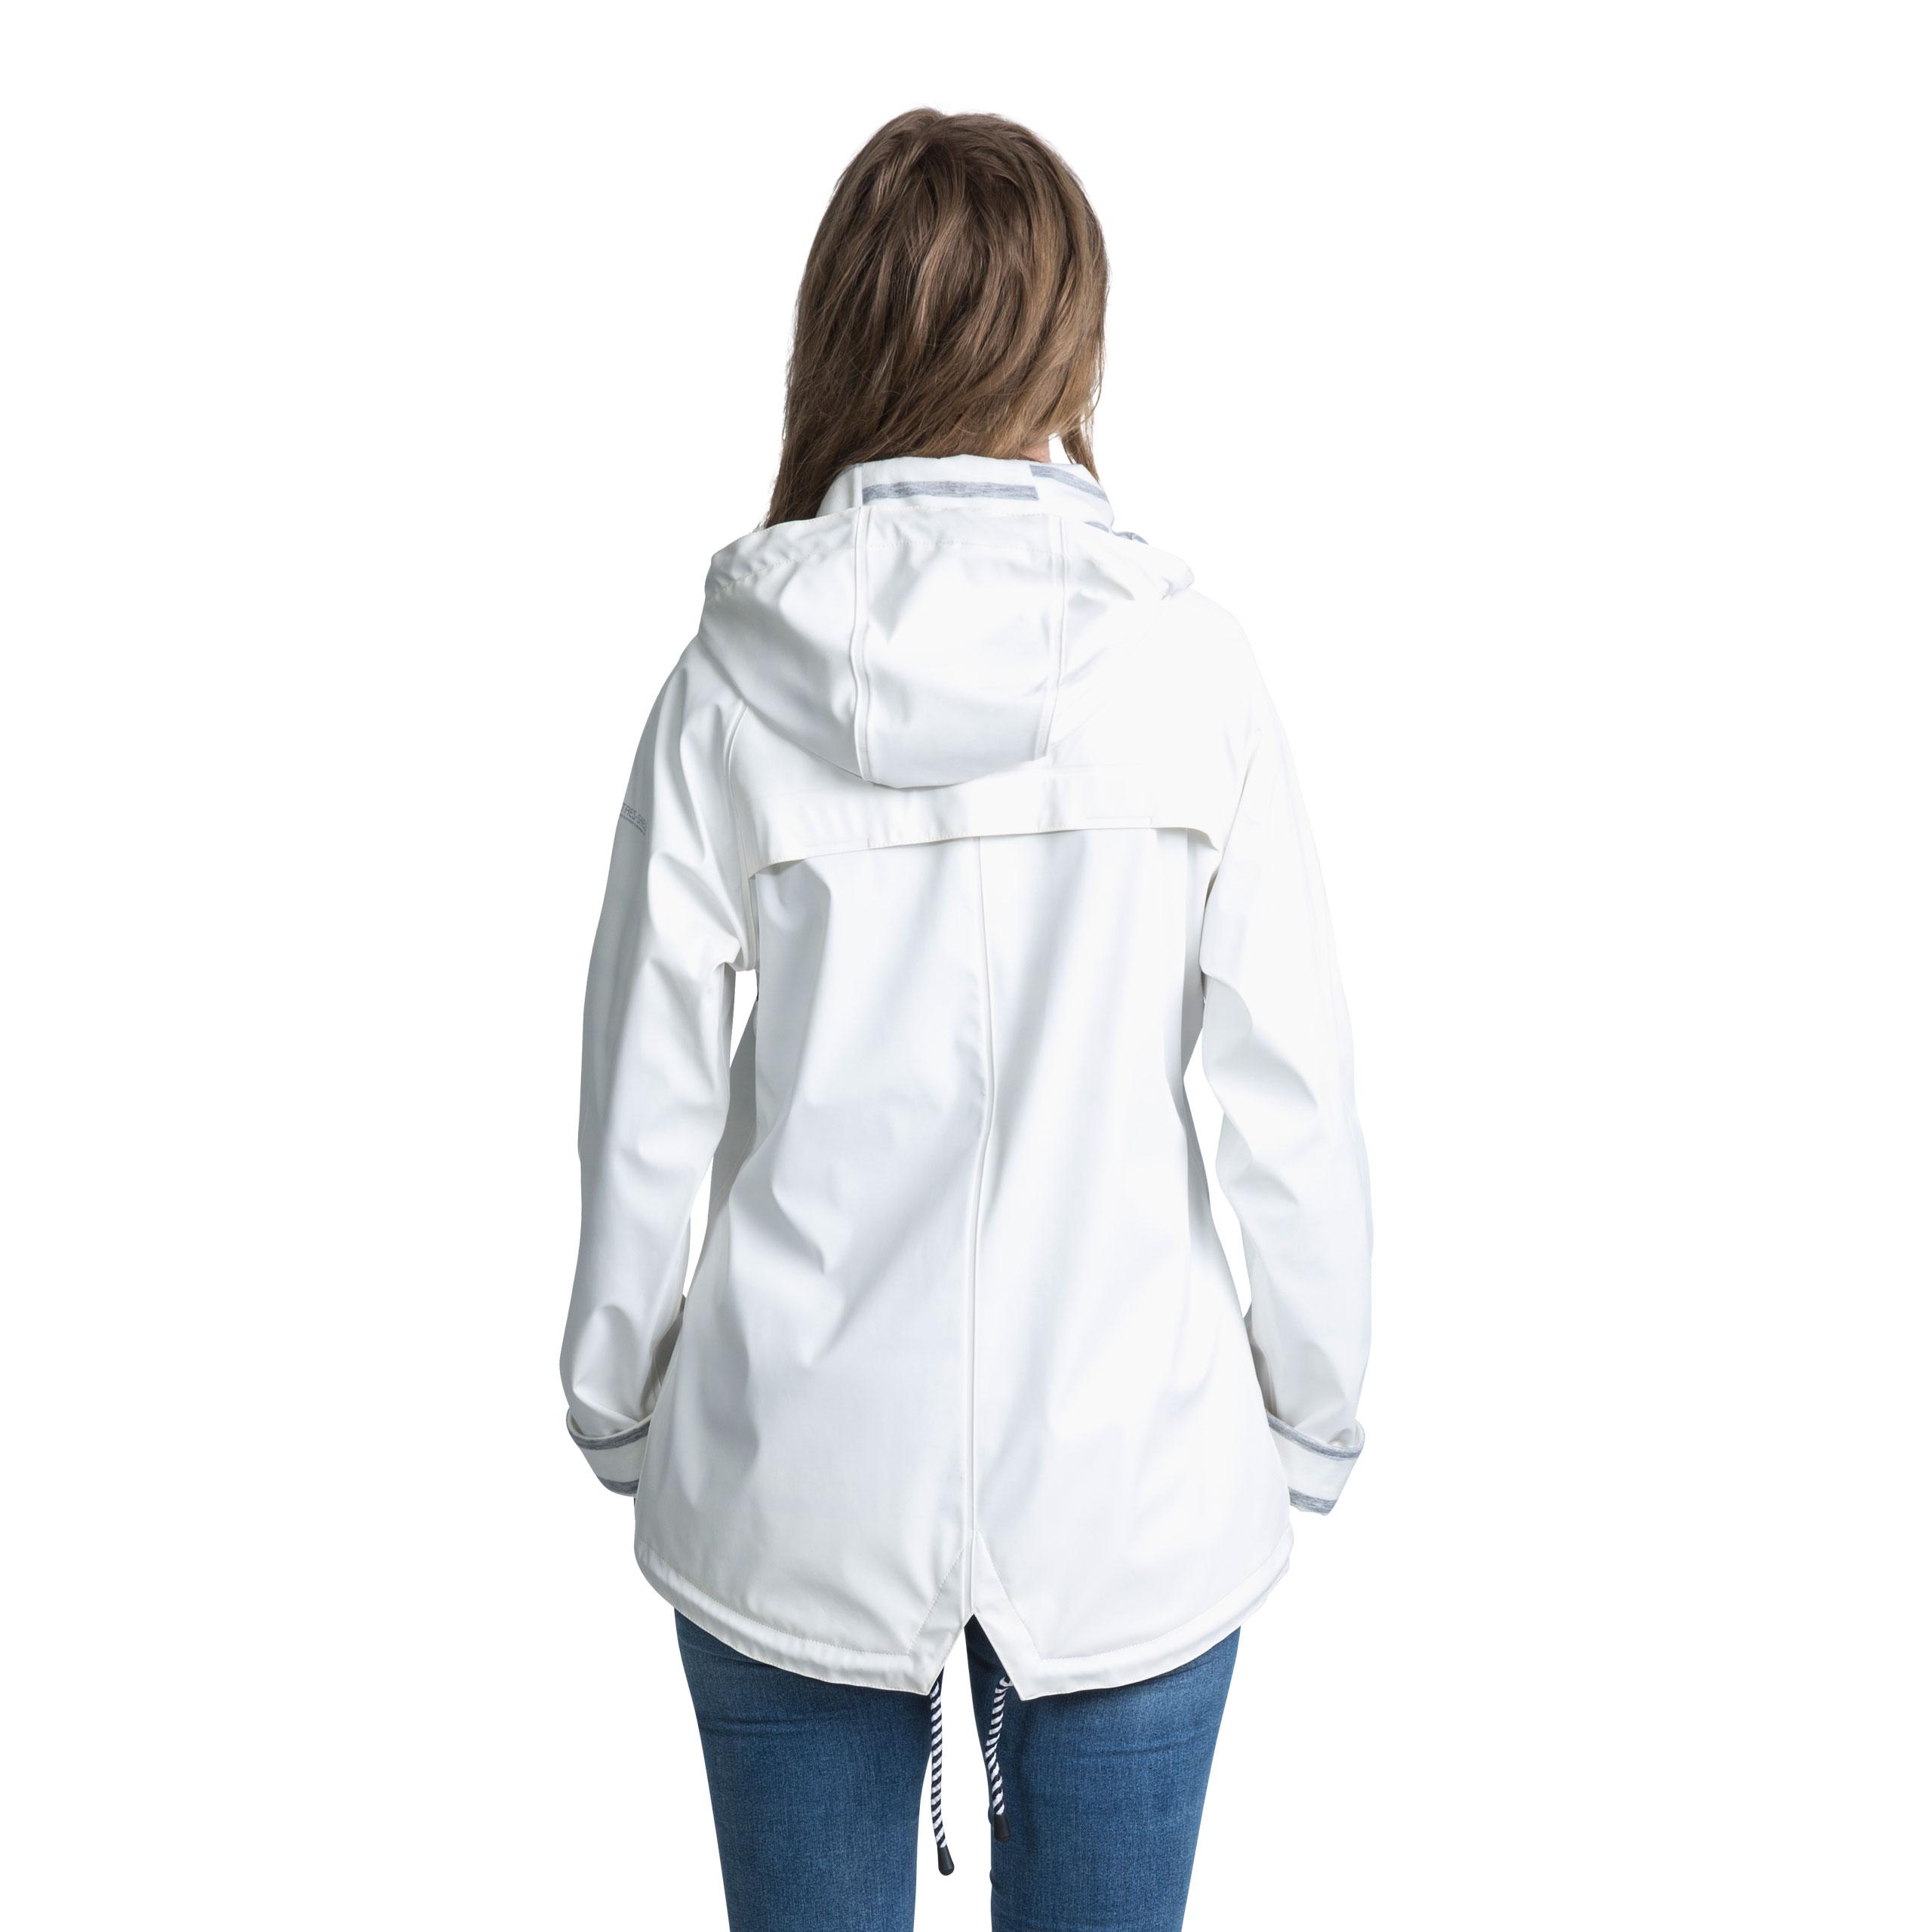 Trespass Muddle Womens Waterproof Jacket Hooded Raincoat Yellow White Blue